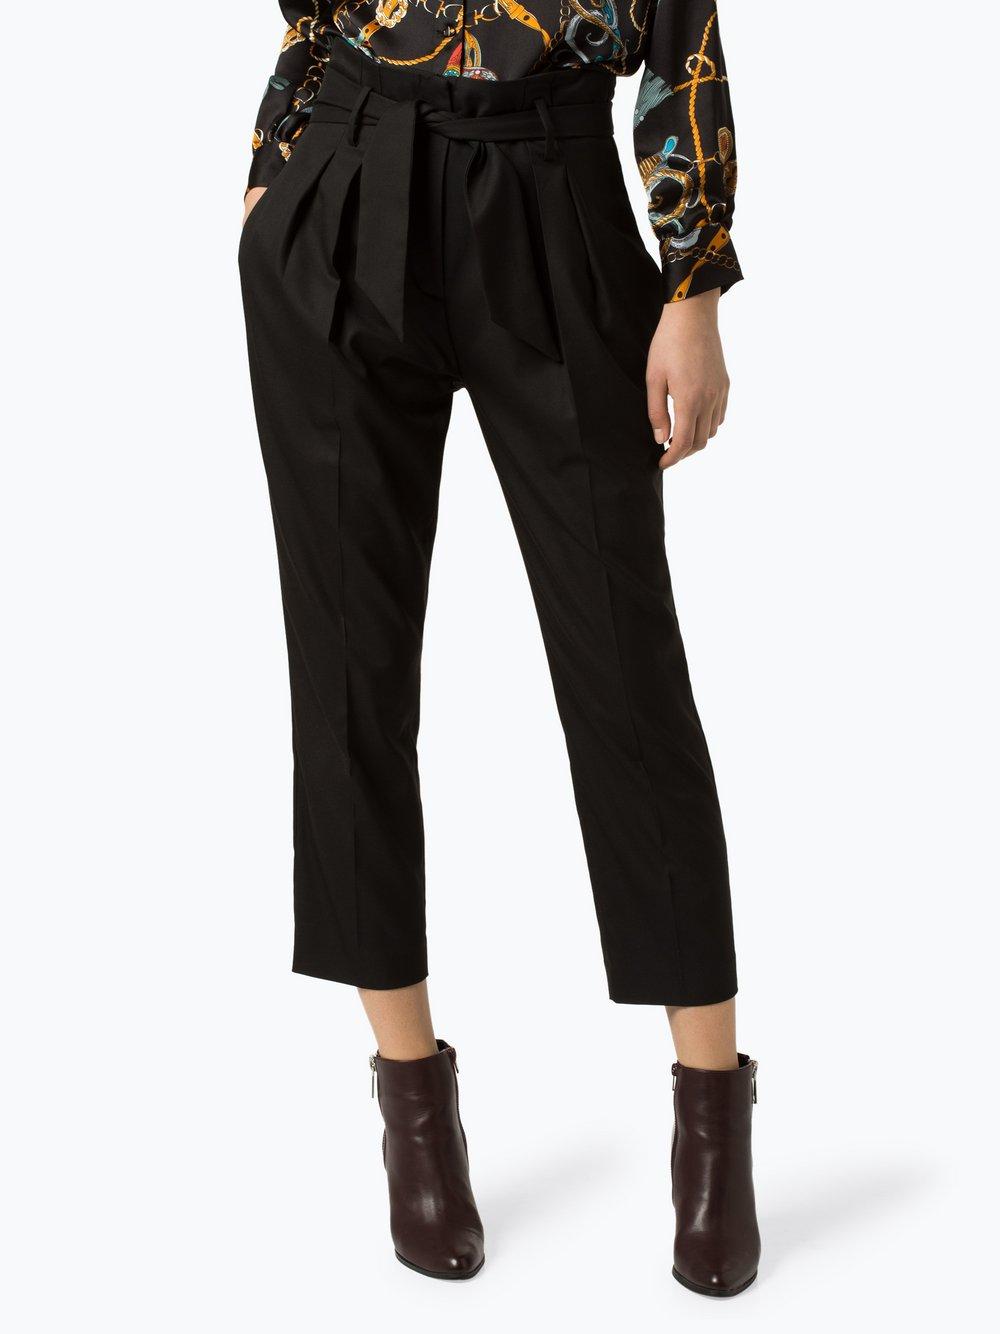 iheart – Spodnie damskie, czarny Van Graaf 418261-0001